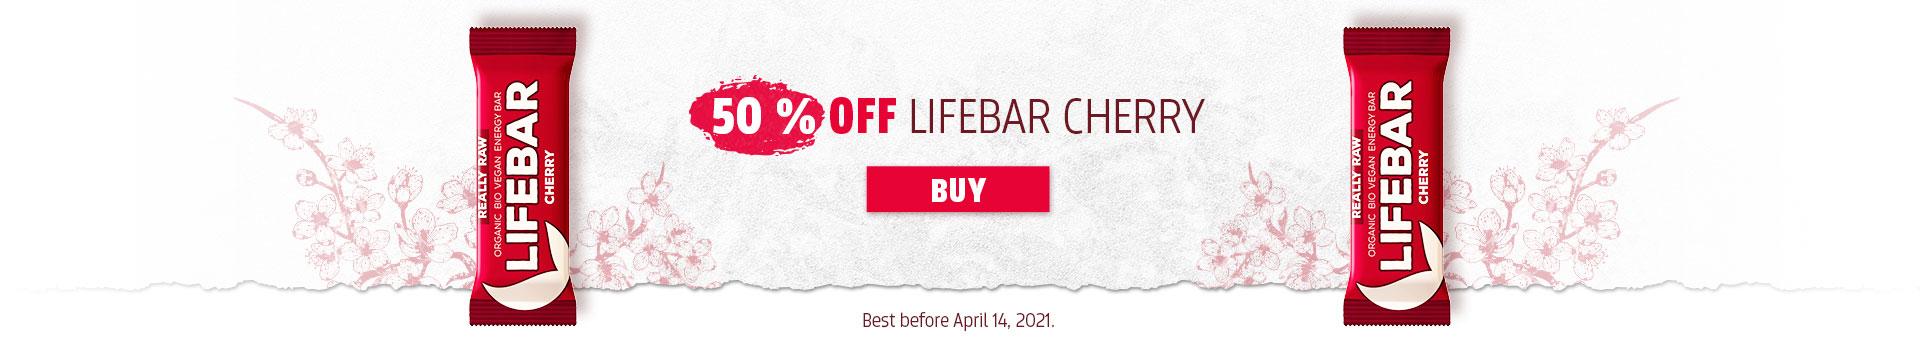 Lifebar